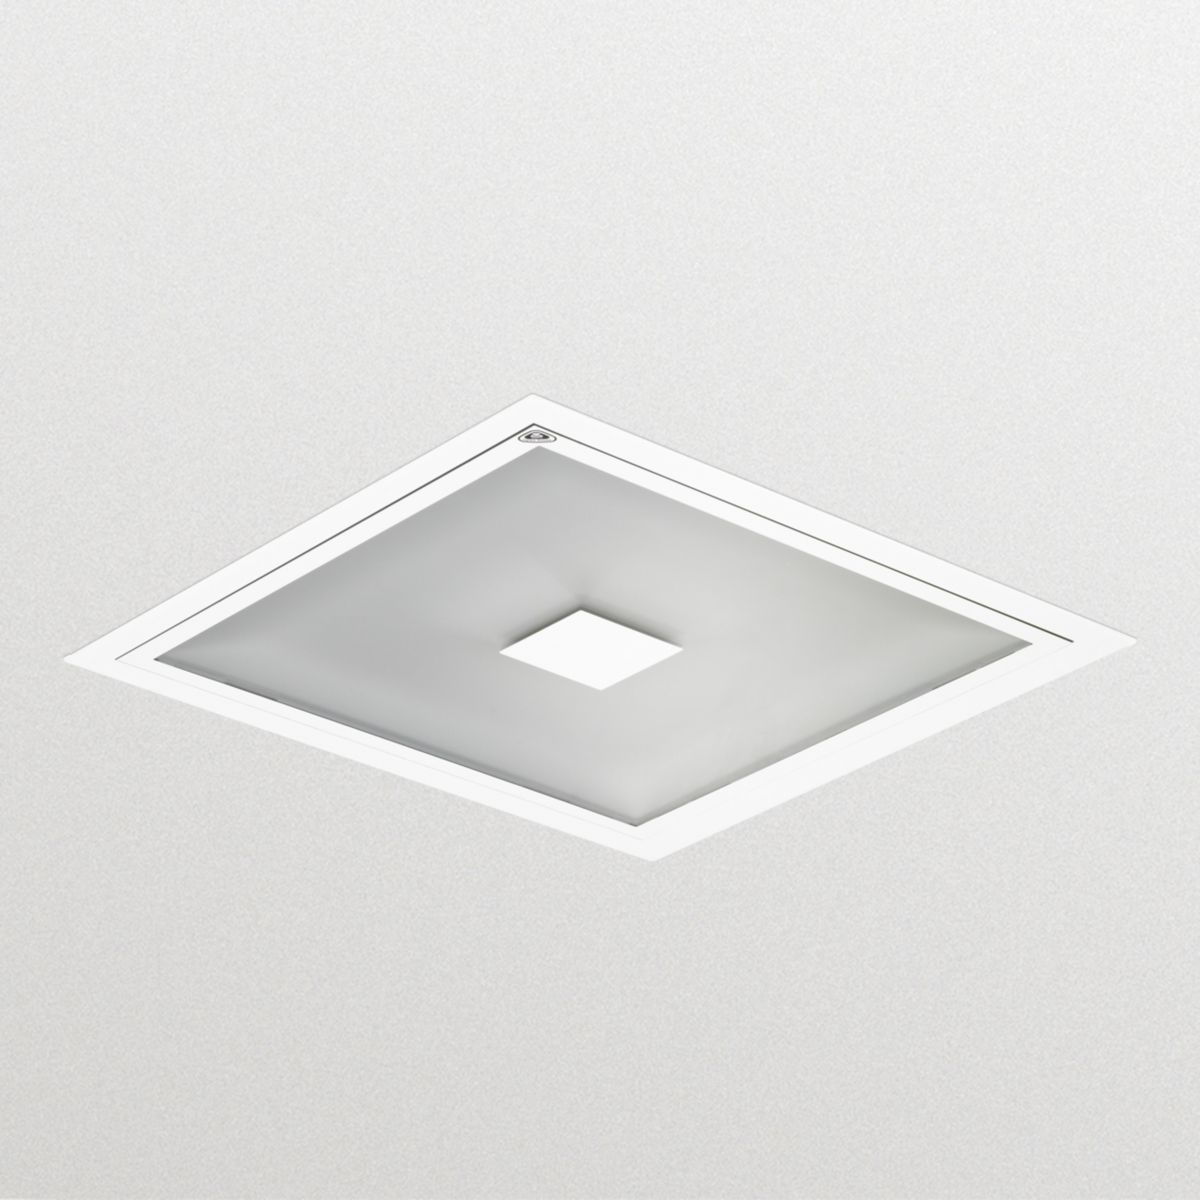 Cleanroom Led Philips Lighting 40w Electronic Ballast Circuit Diagram Image Galleries Imagekbcom